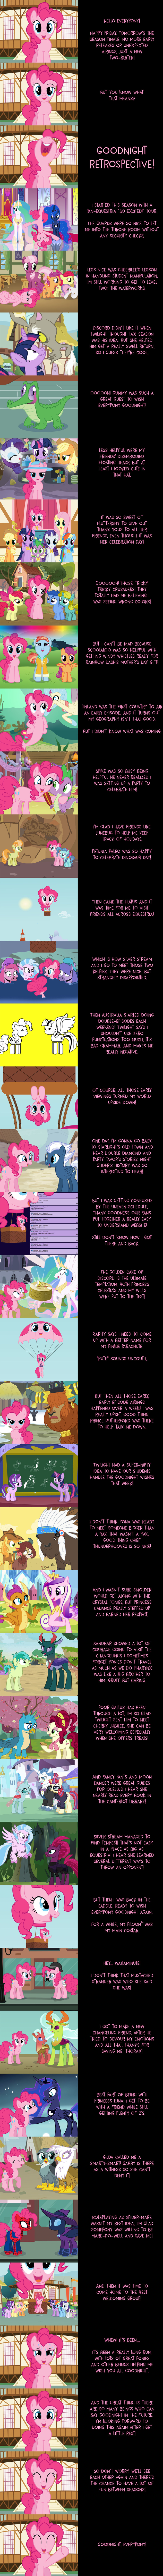 Pinkie Pie Says Goodnight: Retrospective